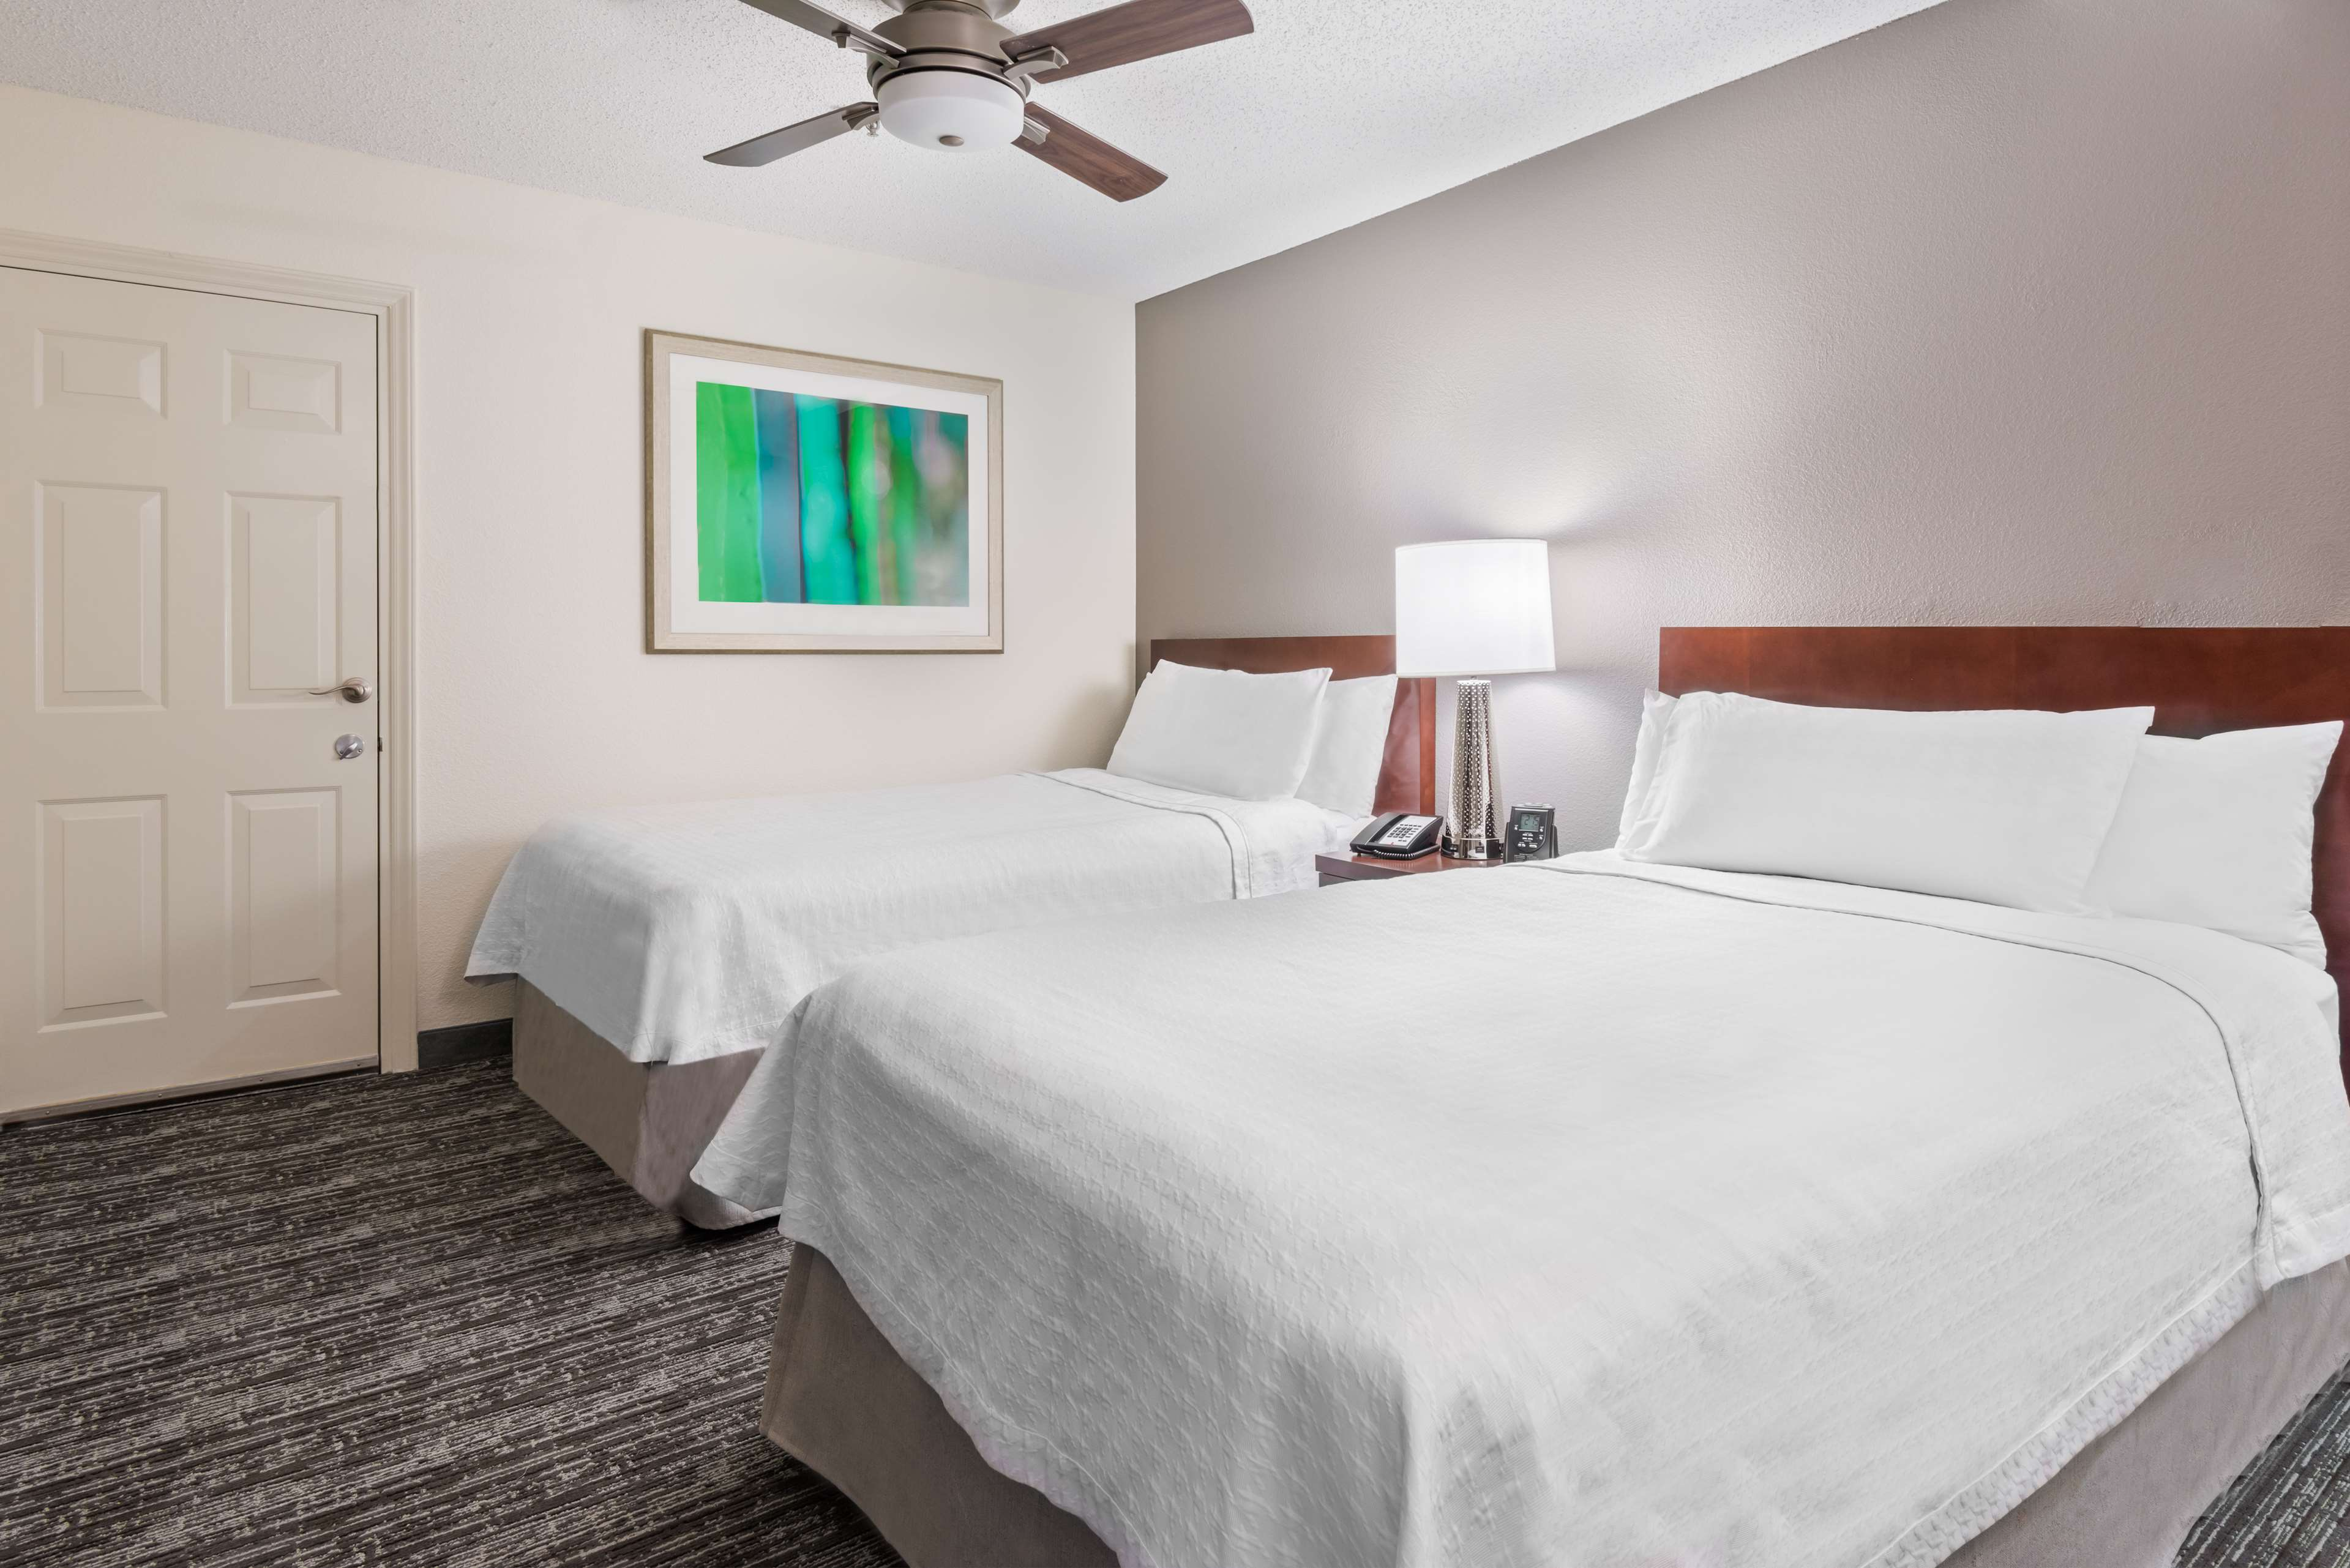 Homewood Suites by Hilton Charlotte-North/Univ Research Park image 13